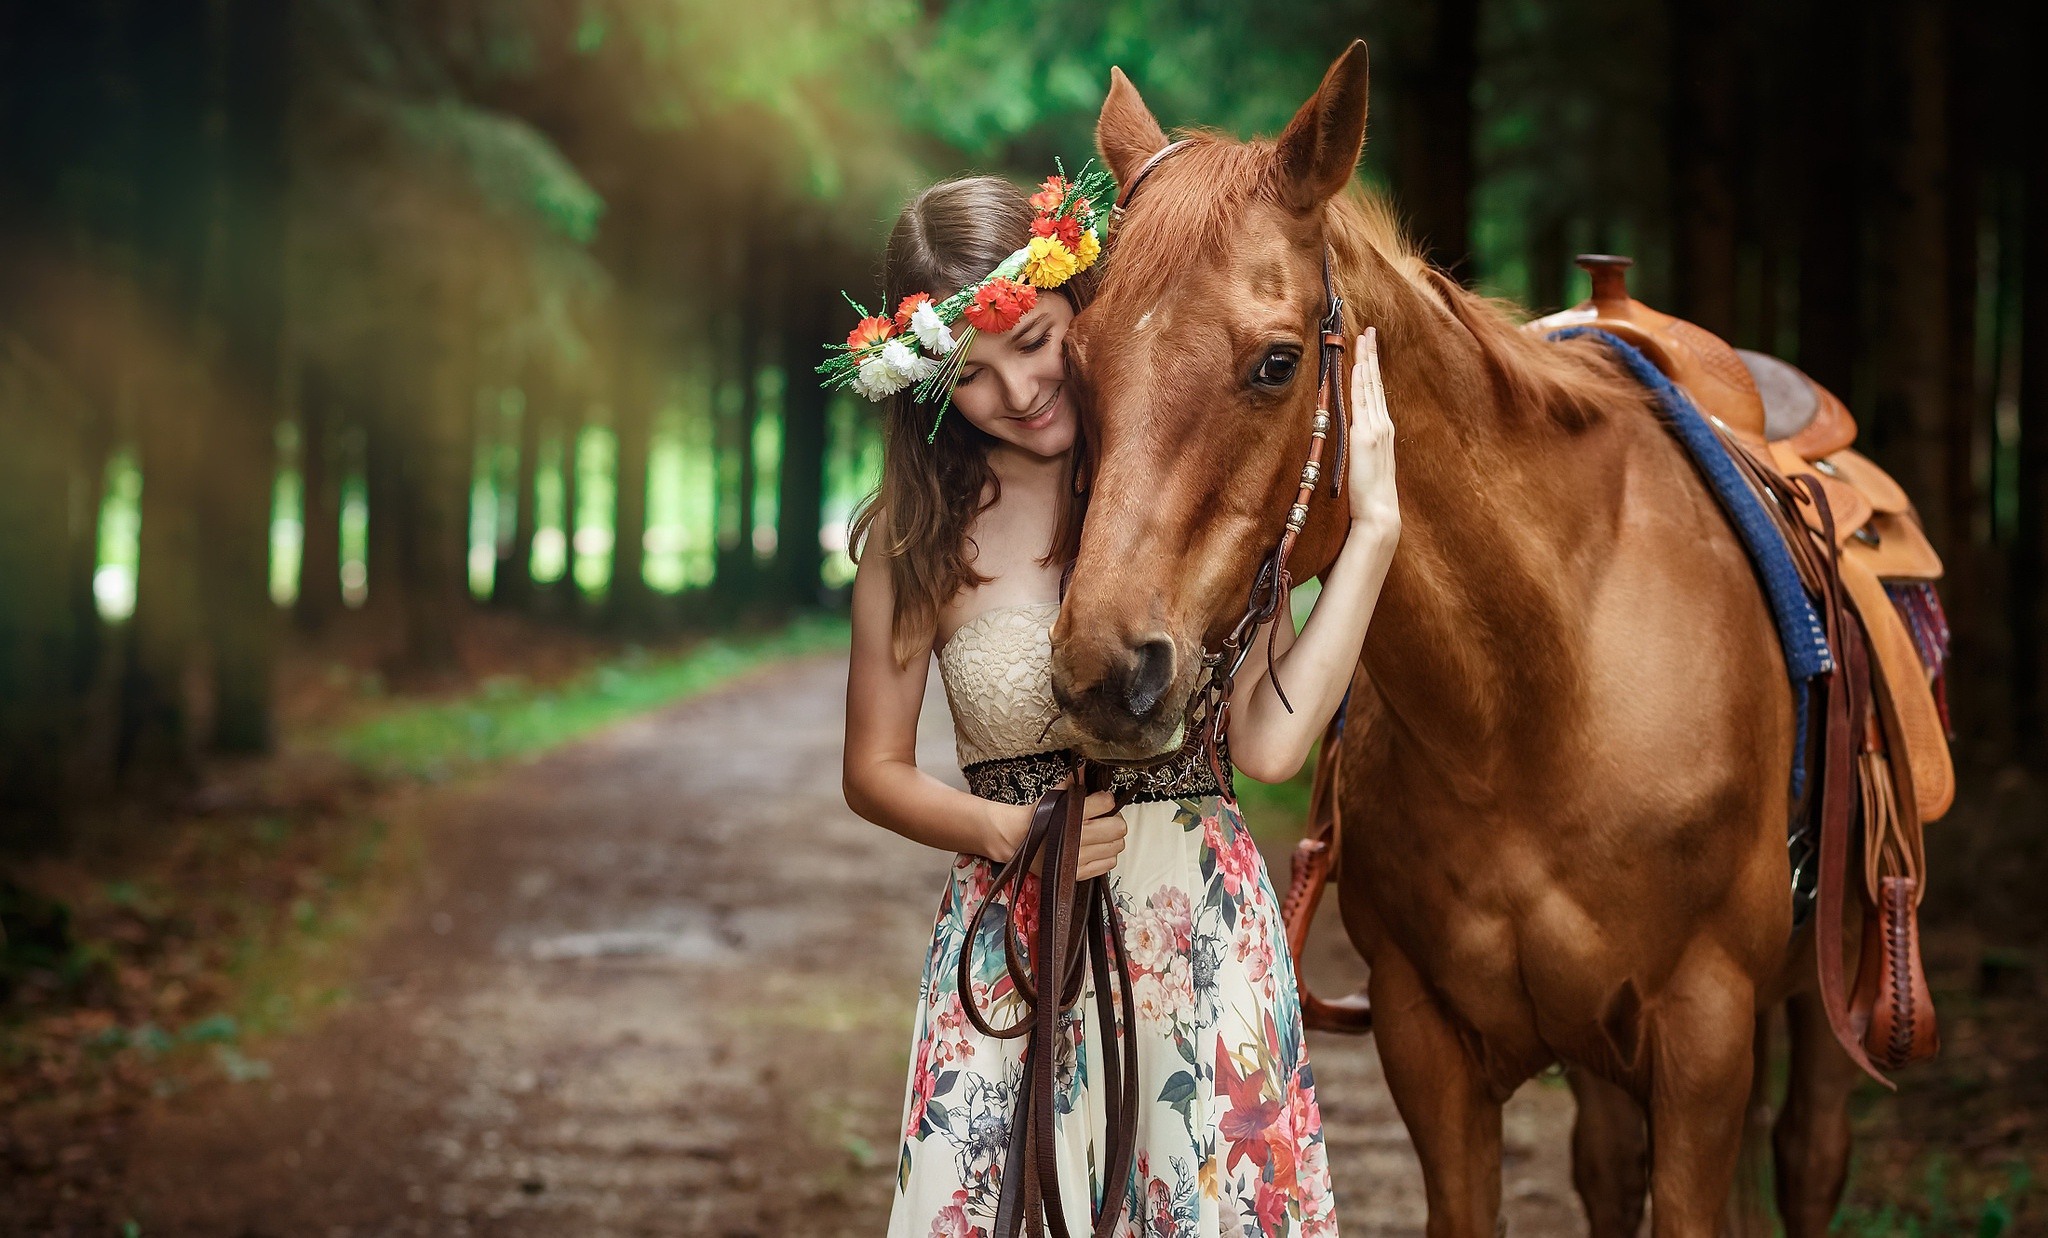 Brunette Depth Of Field Dress Girl Horse Mood Smile Woman Wreath 2048x1238